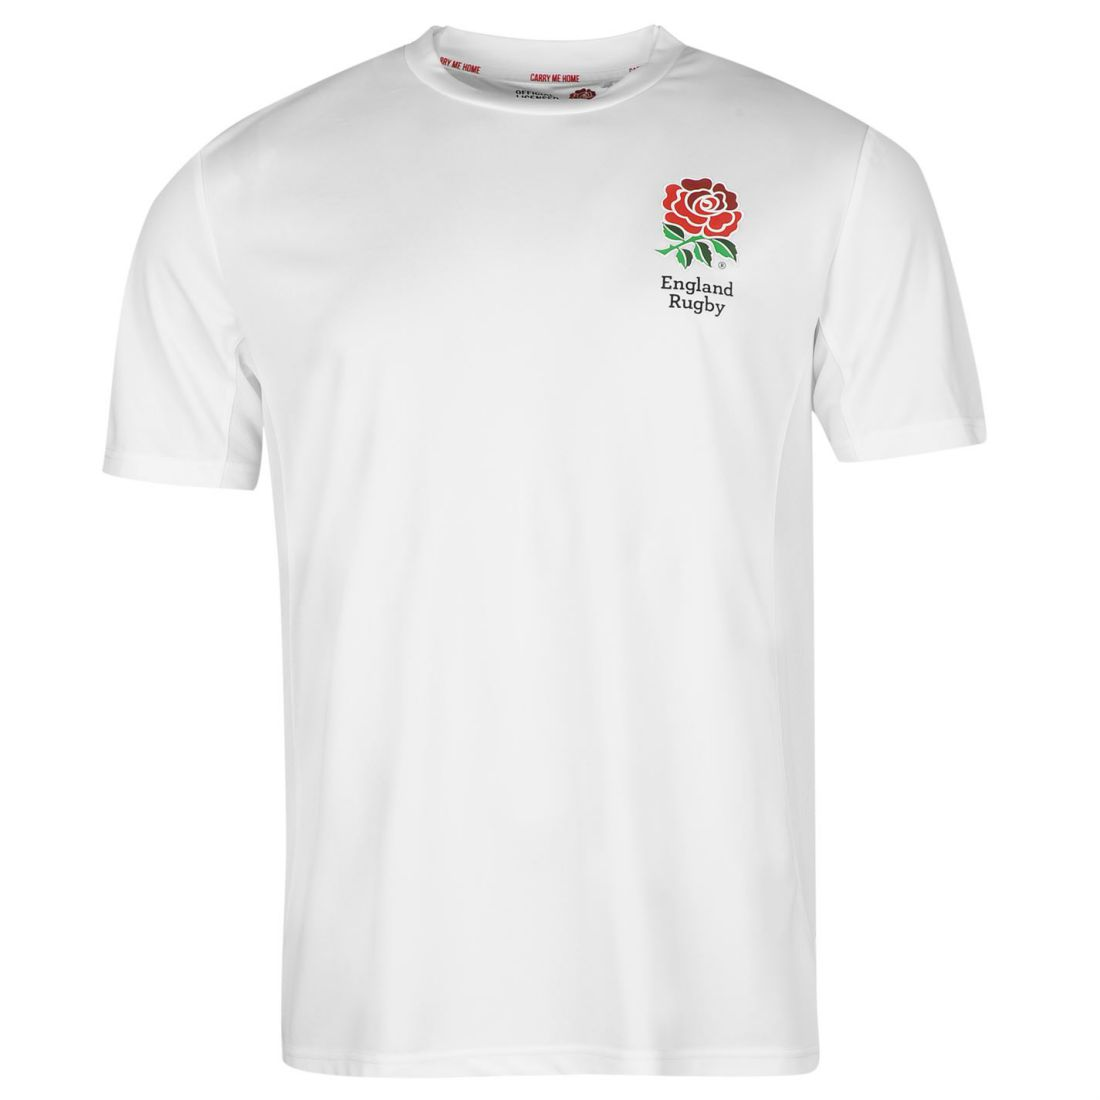 Team Mens England Cricket Cotton Tshirt Tee Top Short Sleeve Crew Neck